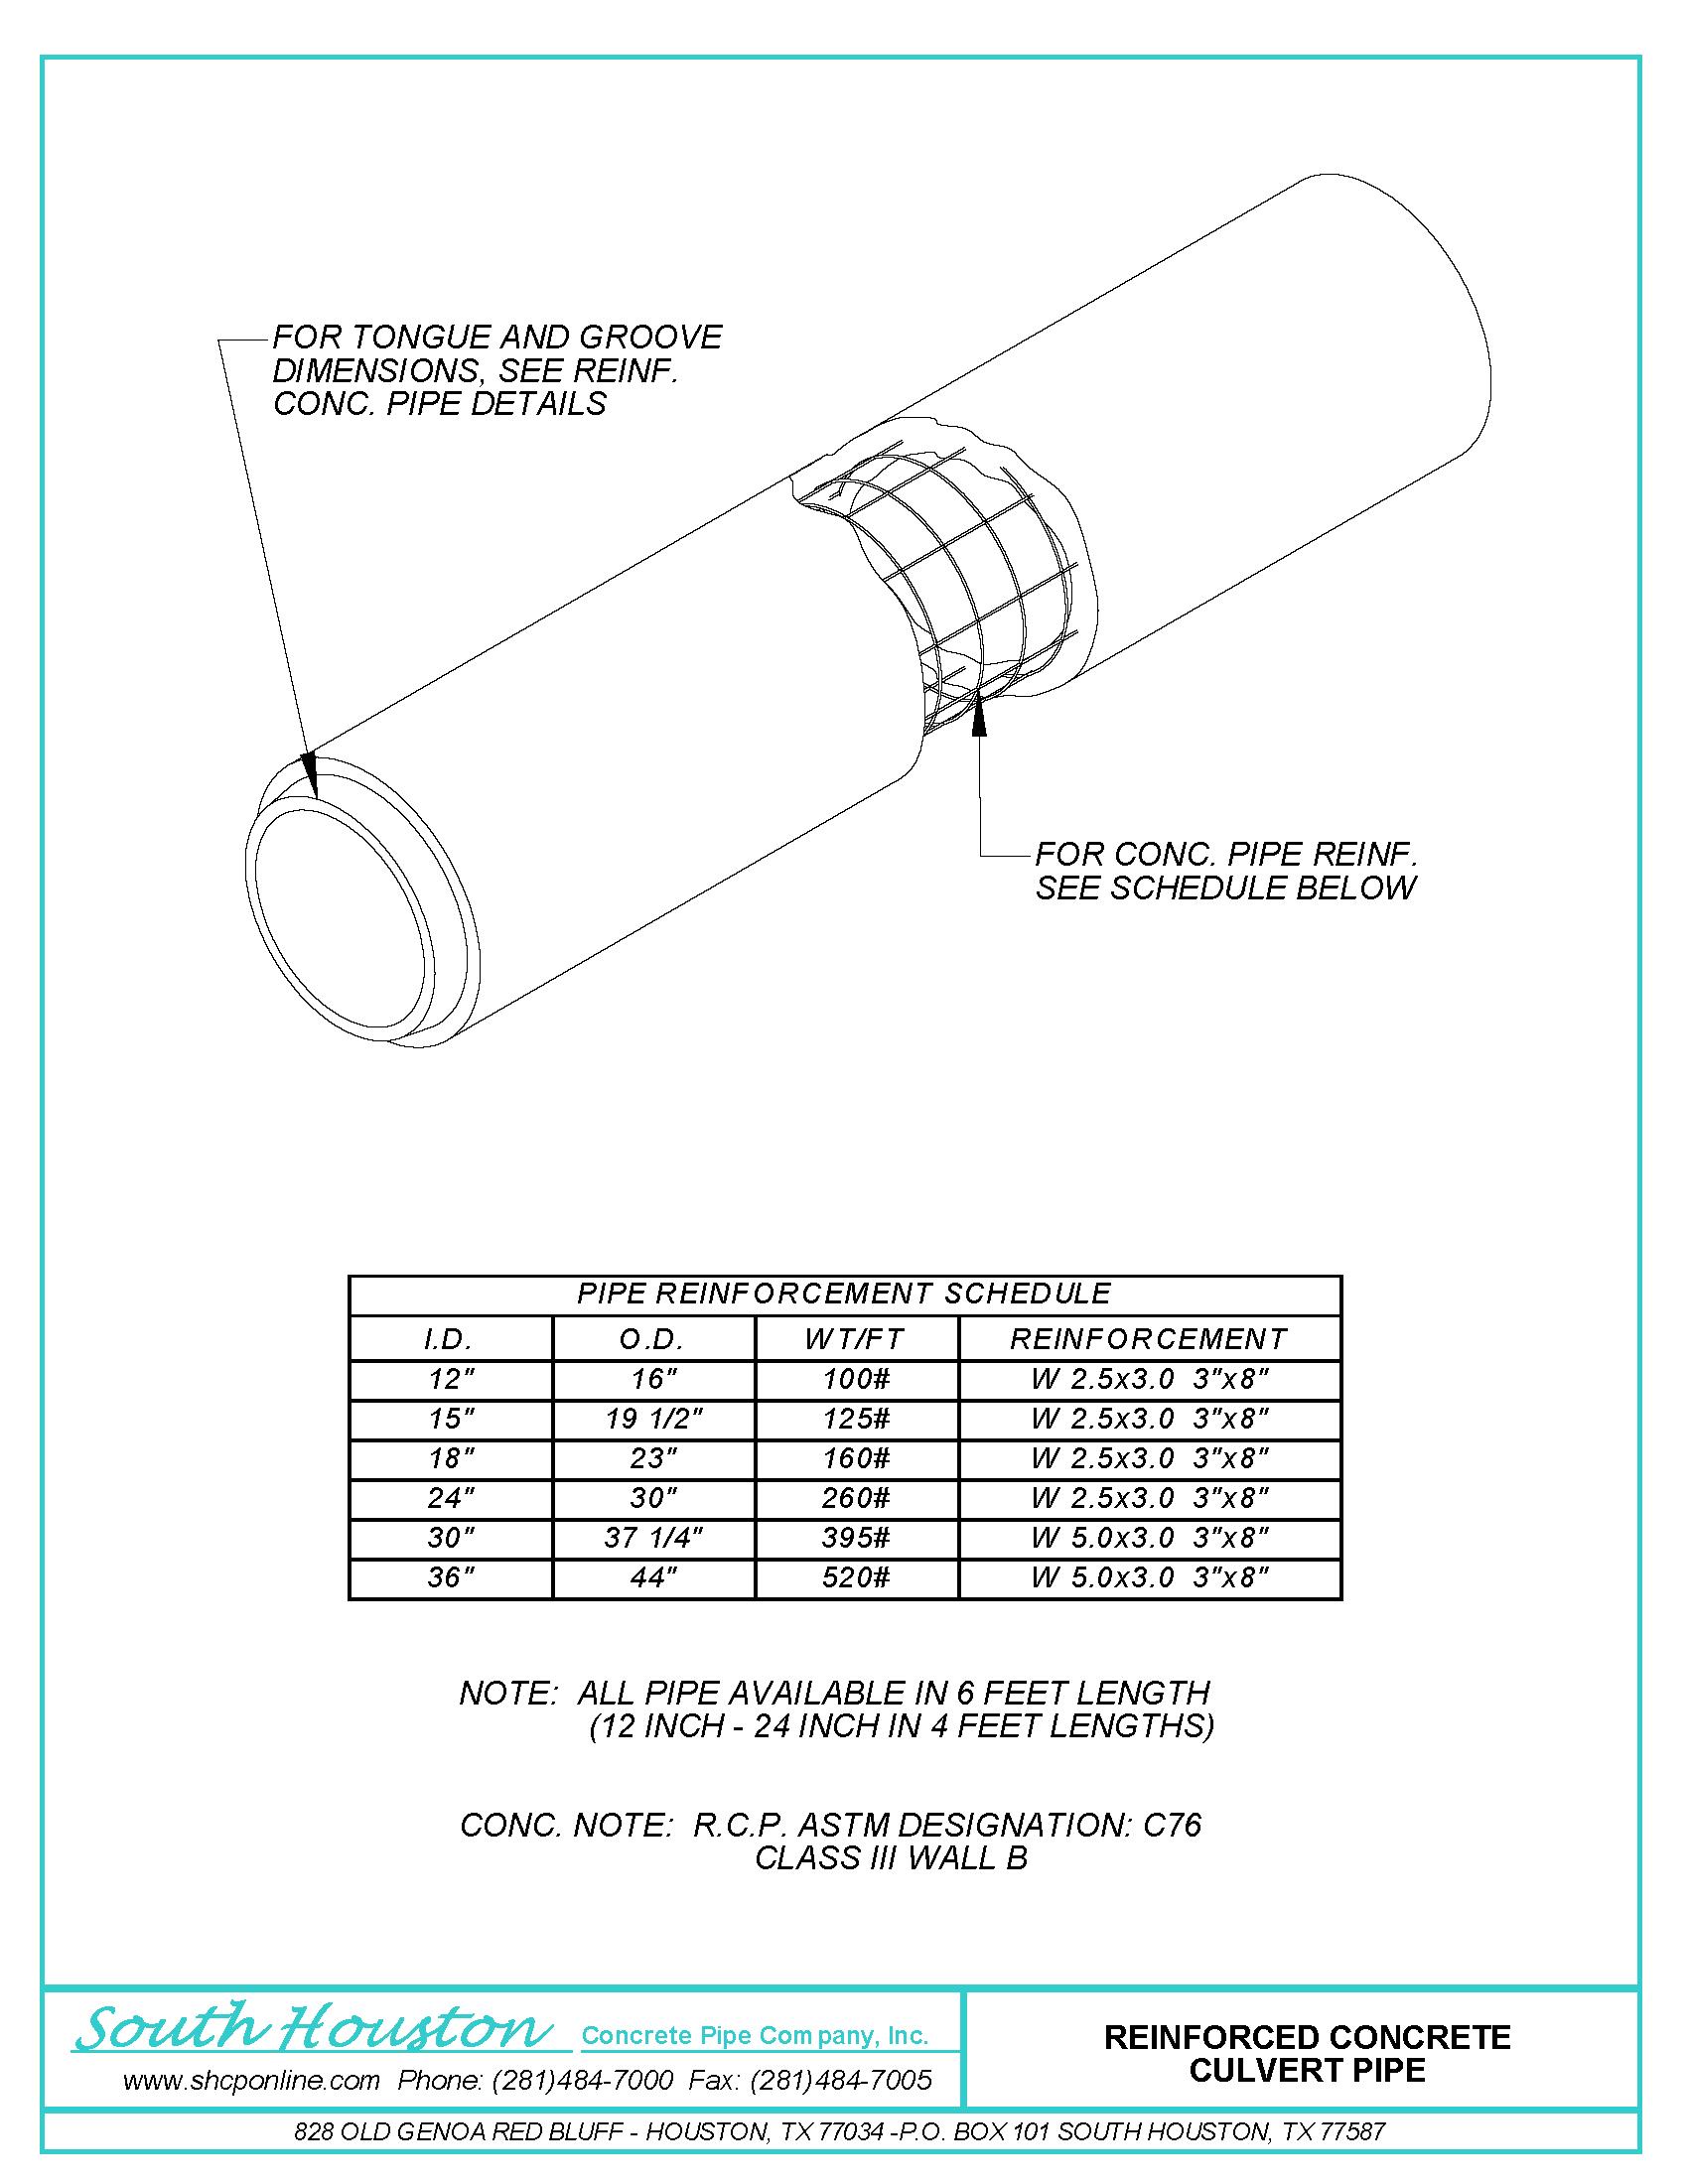 RCP Reinforced Concrete Culvert Pipe - Dim Details | South